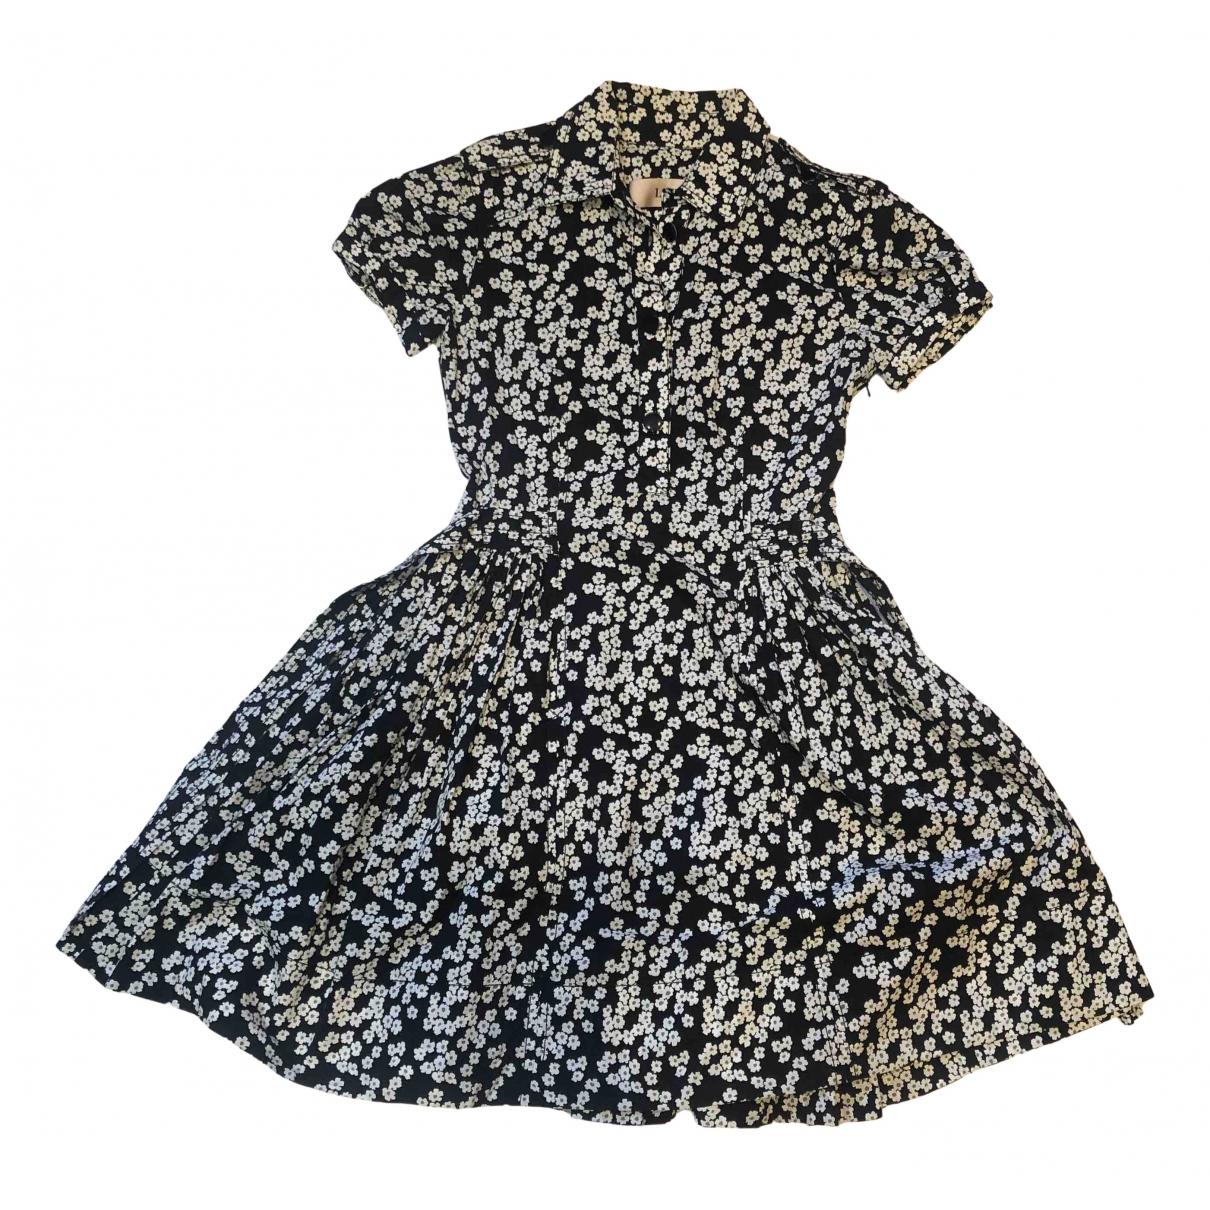 Luella \N Black Cotton dress for Women 40 IT